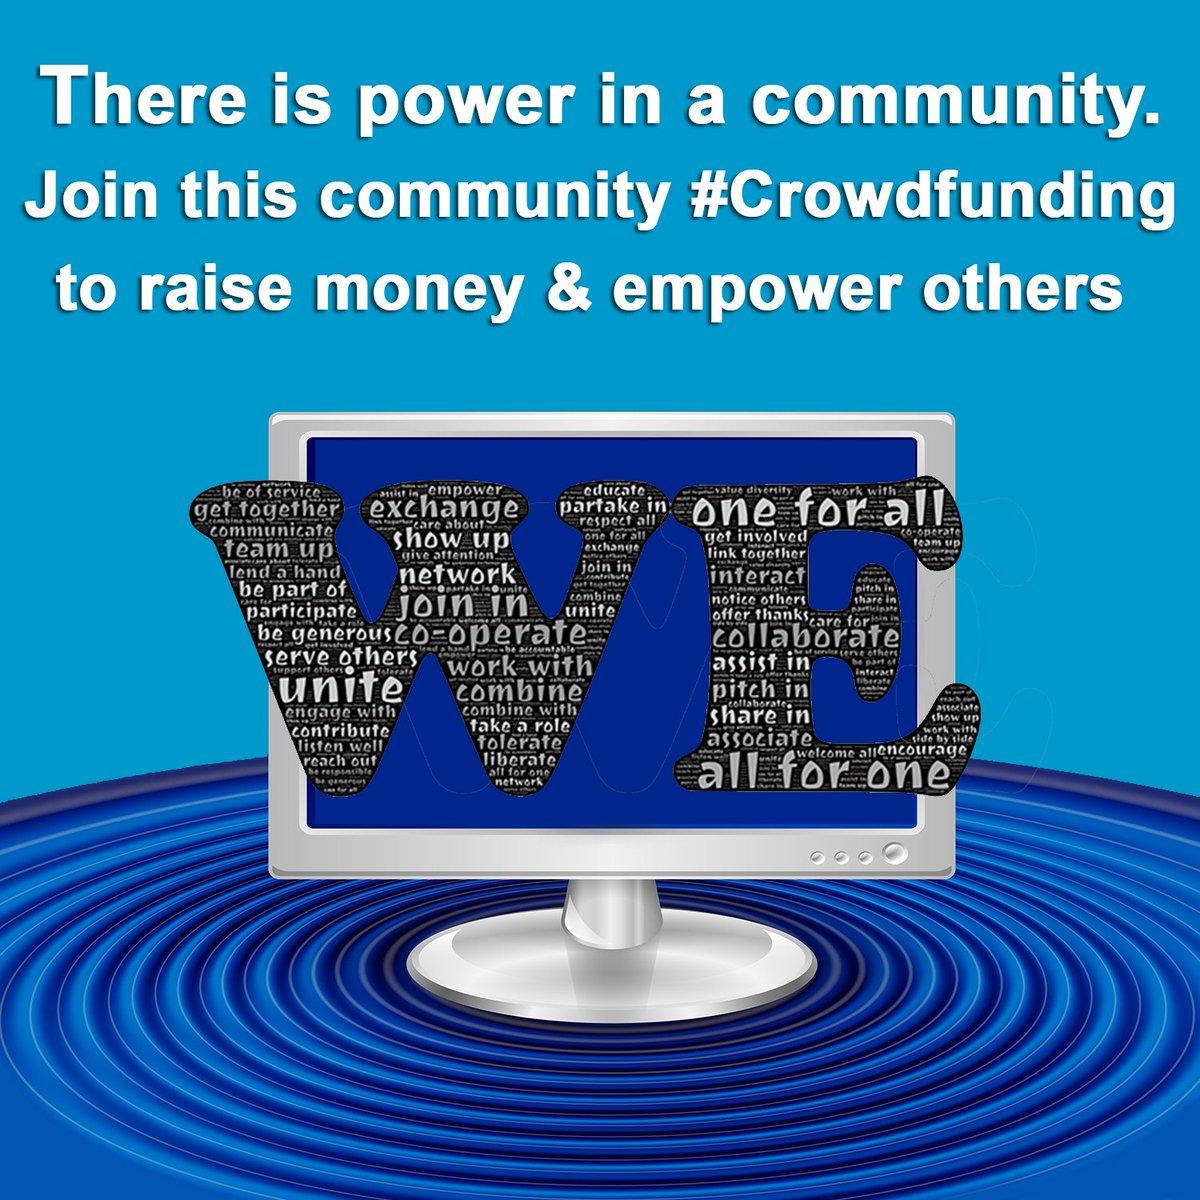 There is power in a community #CrowdFunding    https://t.co/HAUwwlWqJr https://t.co/jOBG22Fpwz